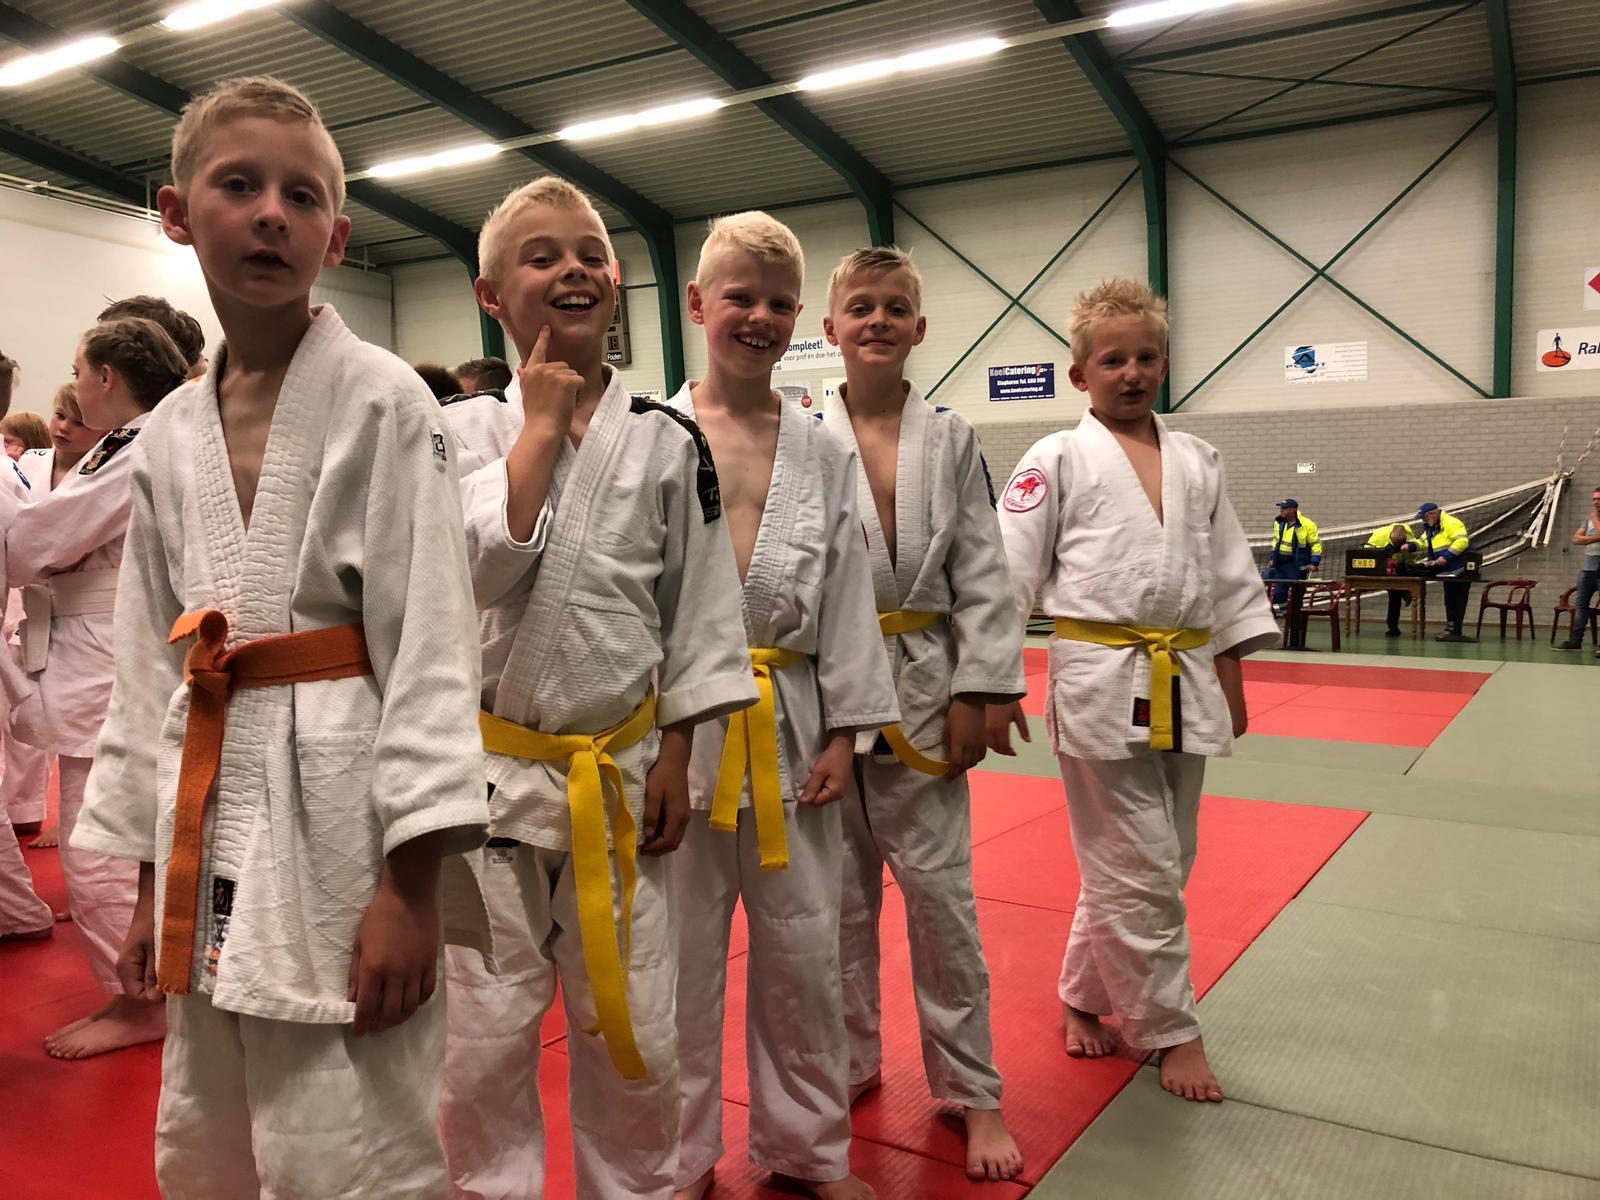 19-05-25-Heren-Slagharen-2019